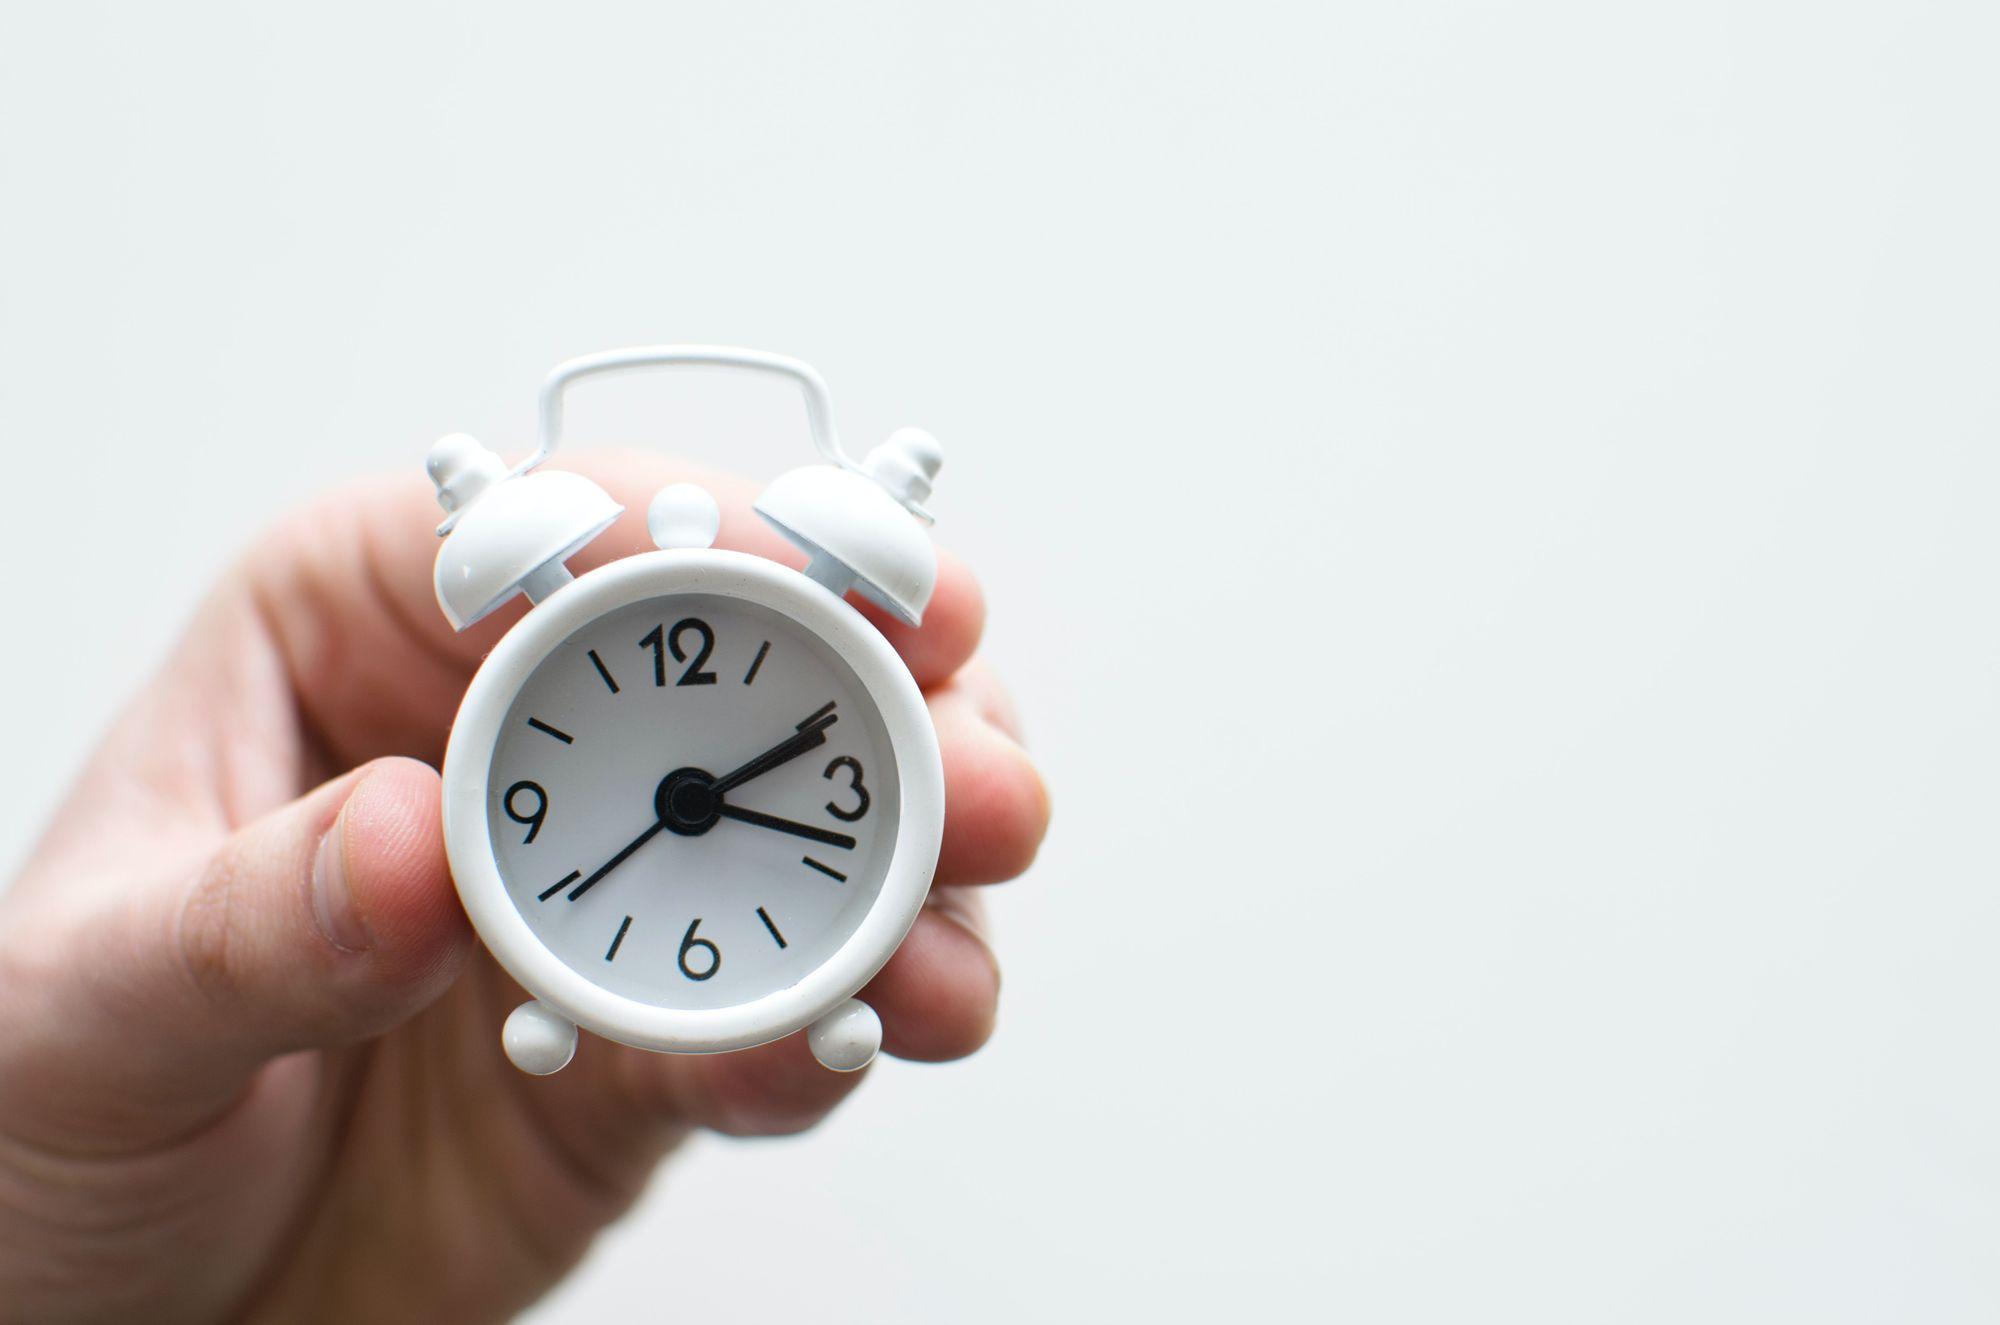 hand holding analog clock